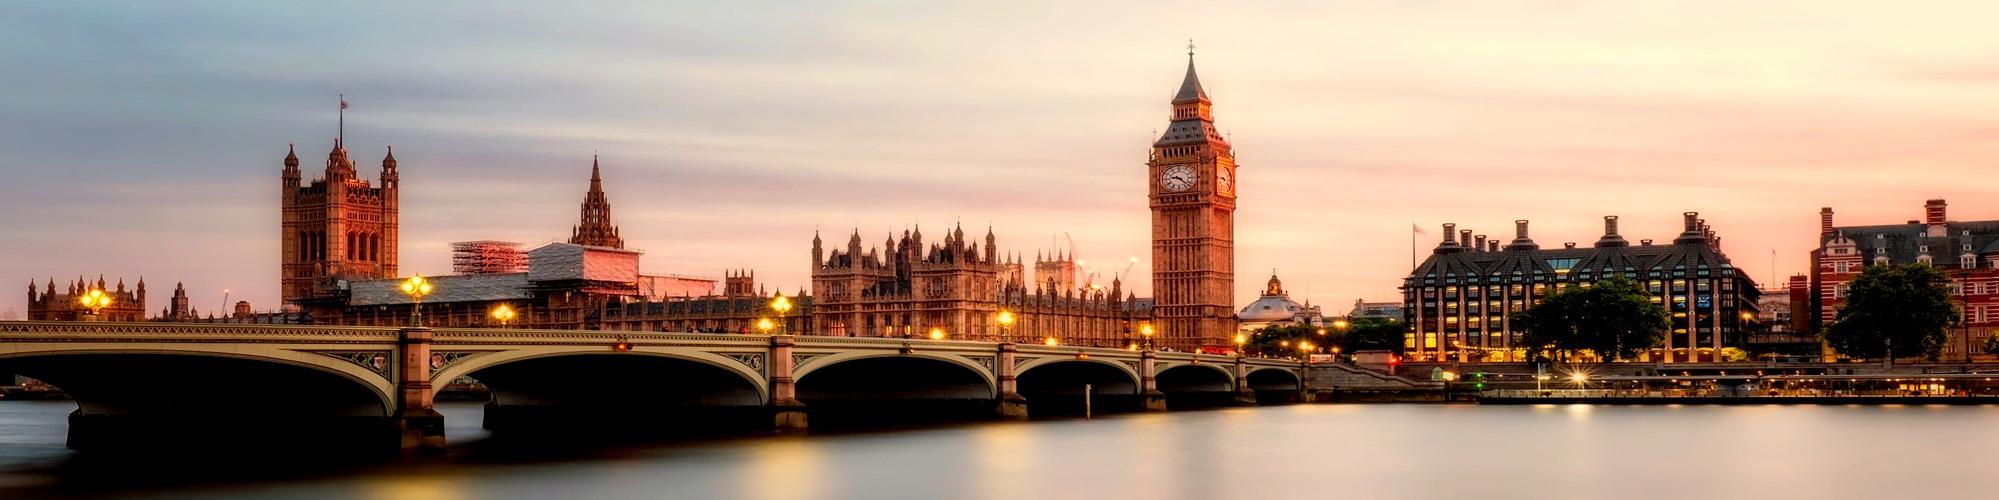 Londra-Bet-Healing